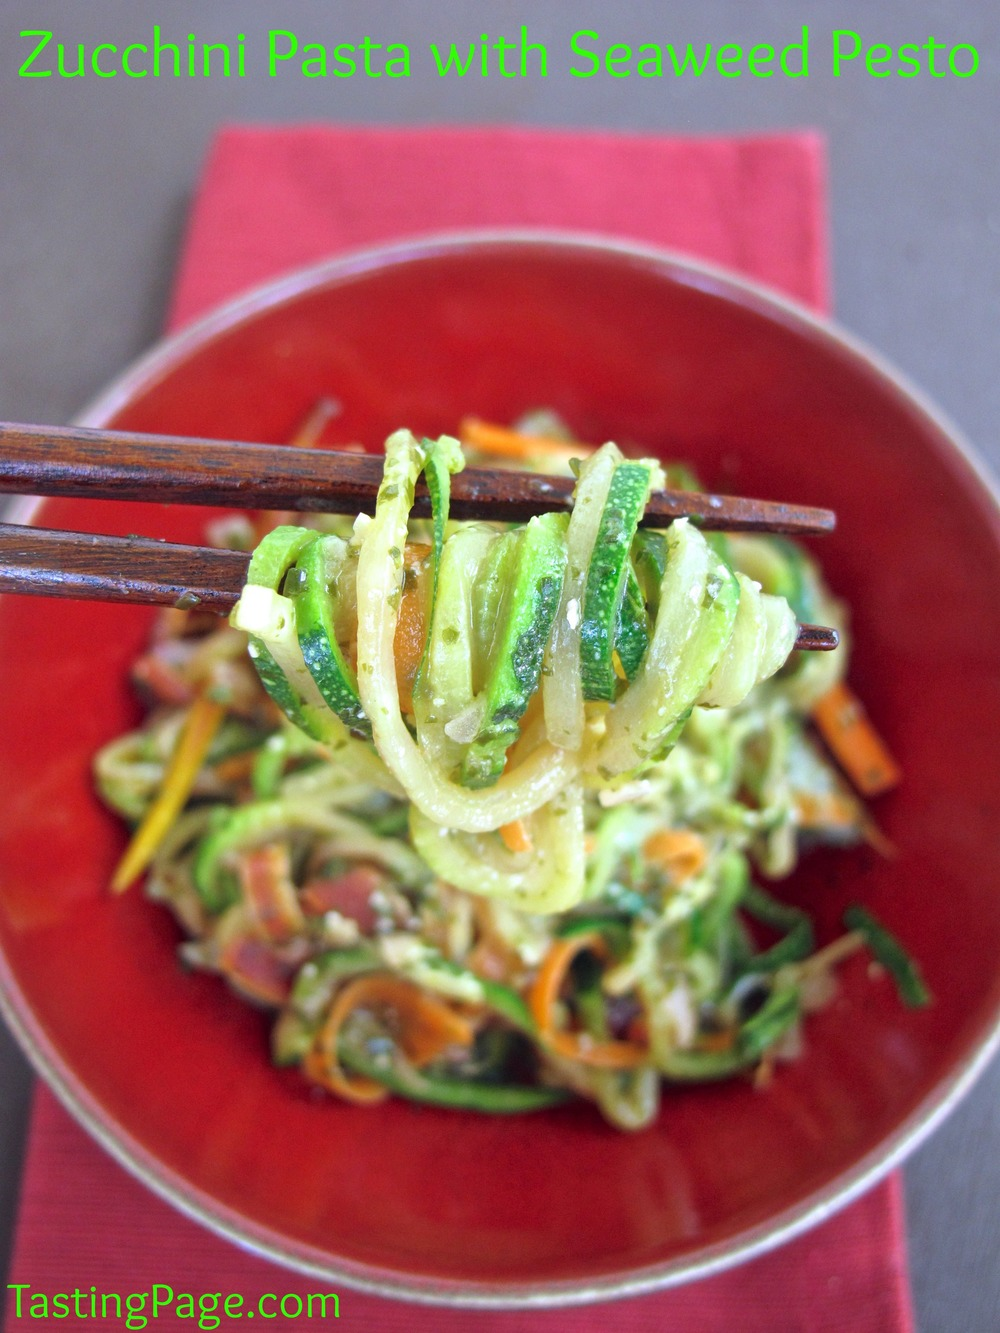 how to make zucchini and squash taste good